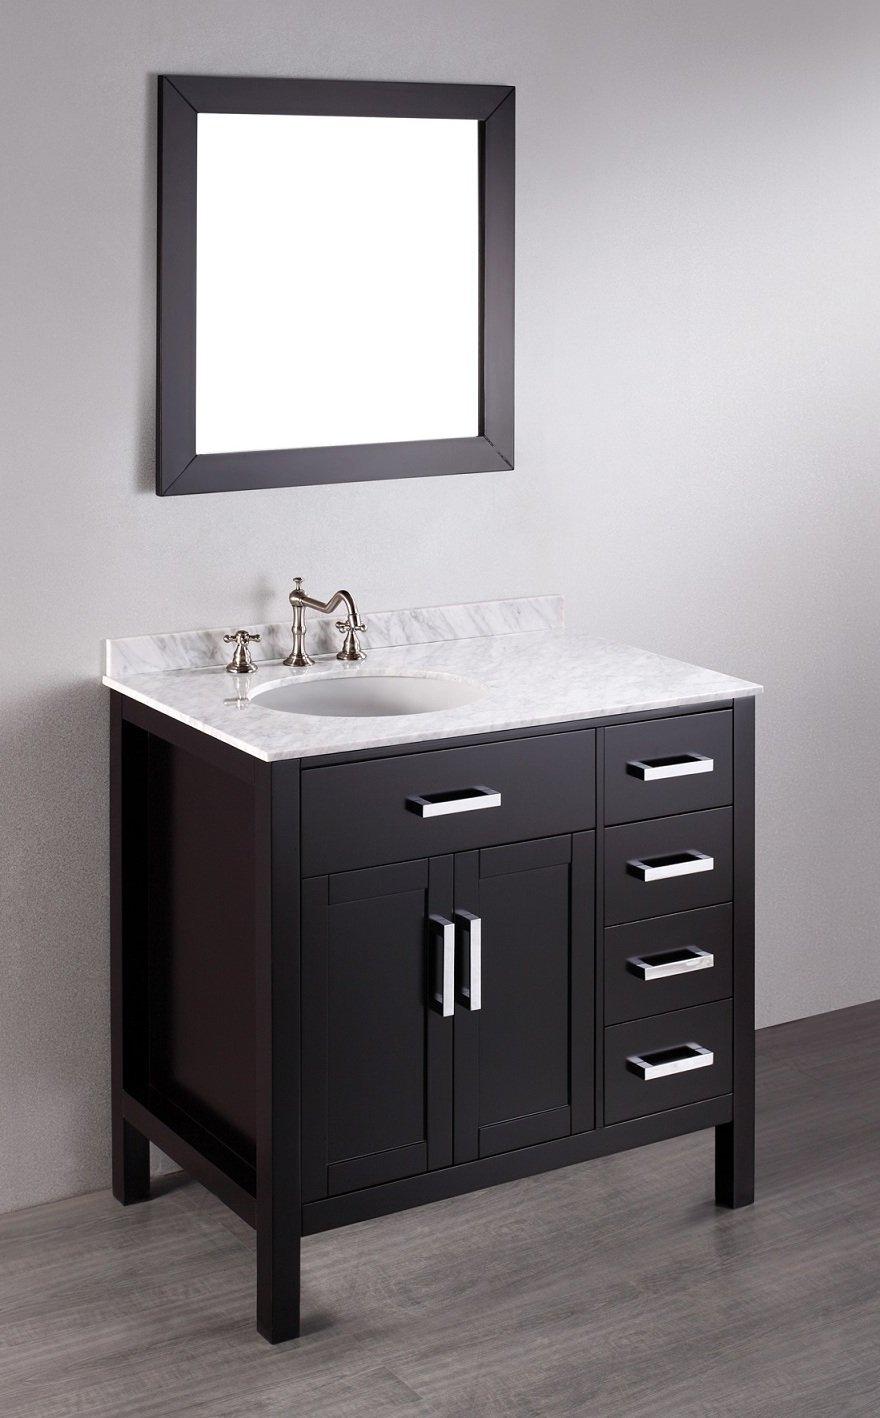 Bosconi Bathroom Vanities SB-2105 Contemporary Single Vanity with ...